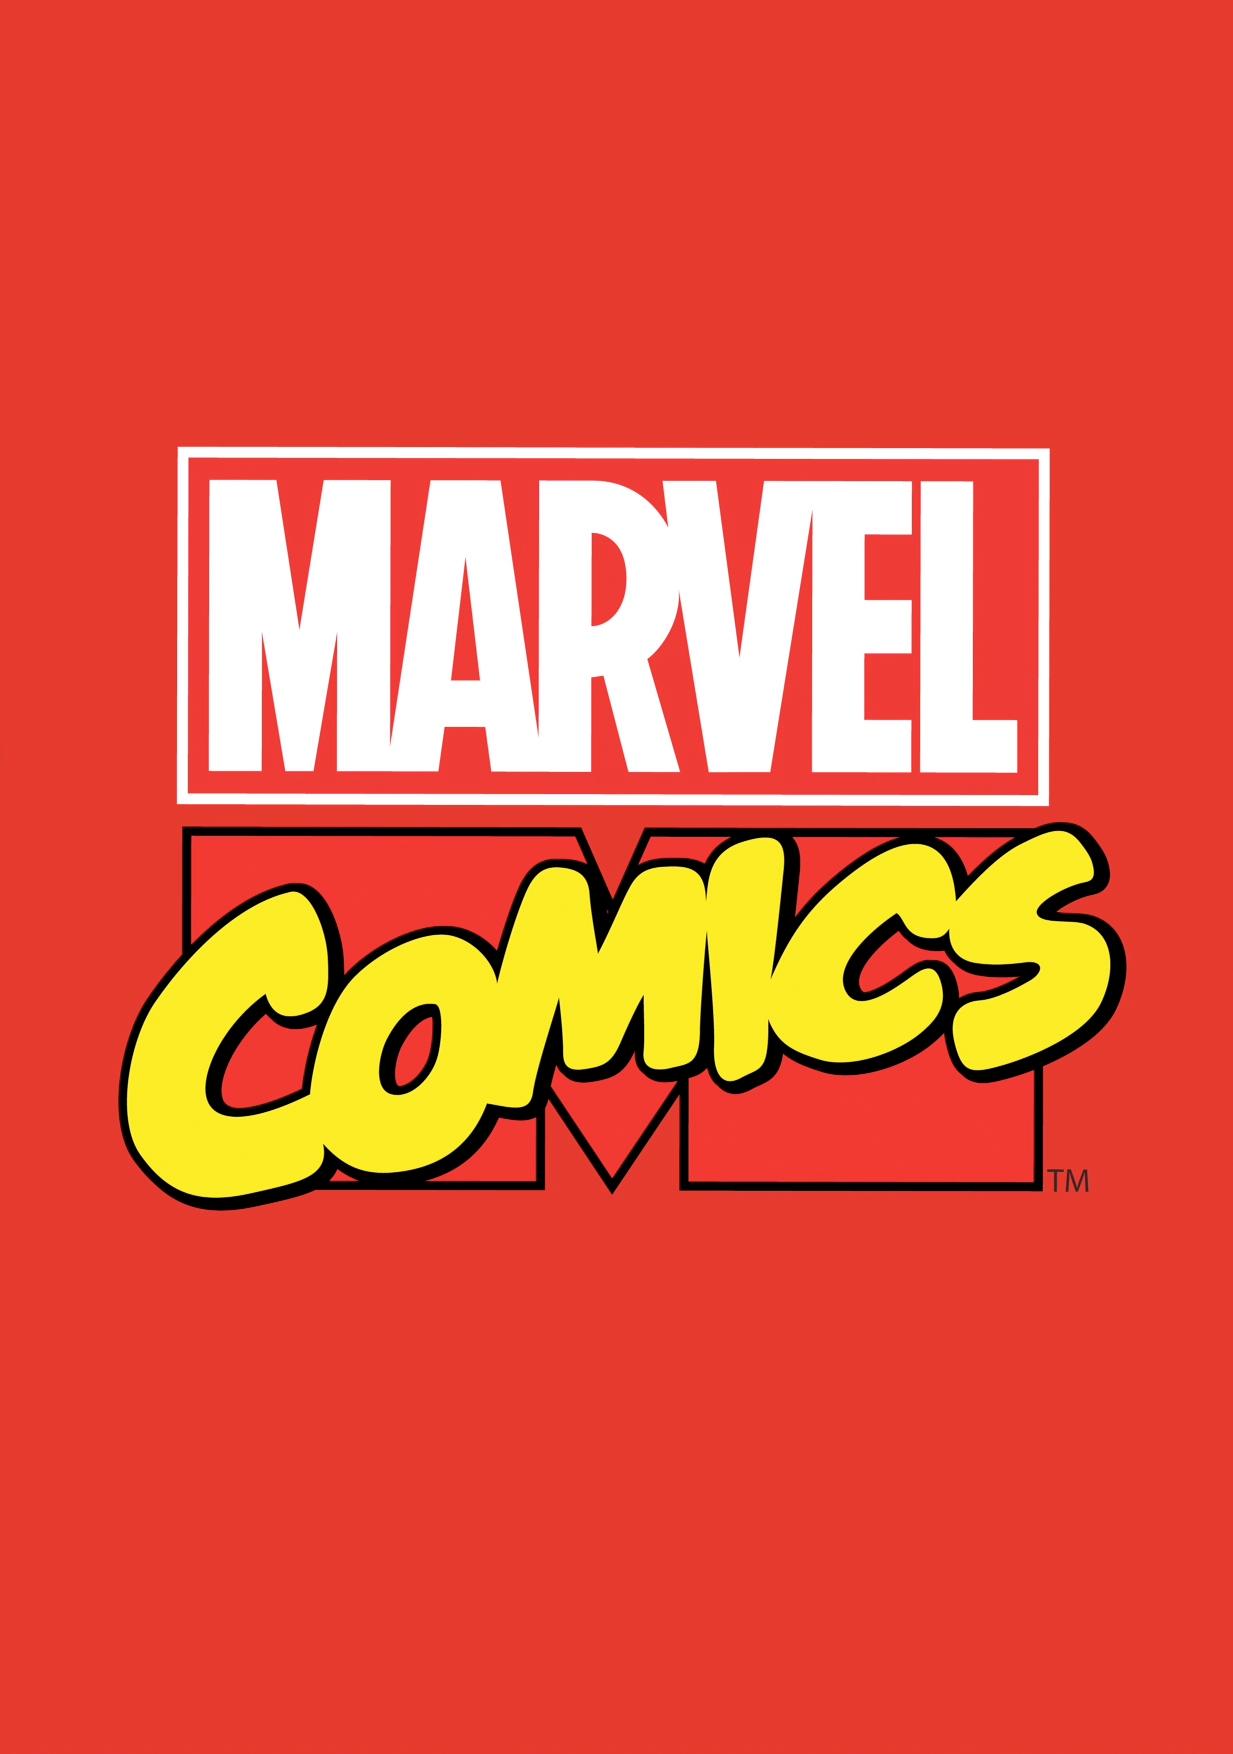 Marvel comics Logos.